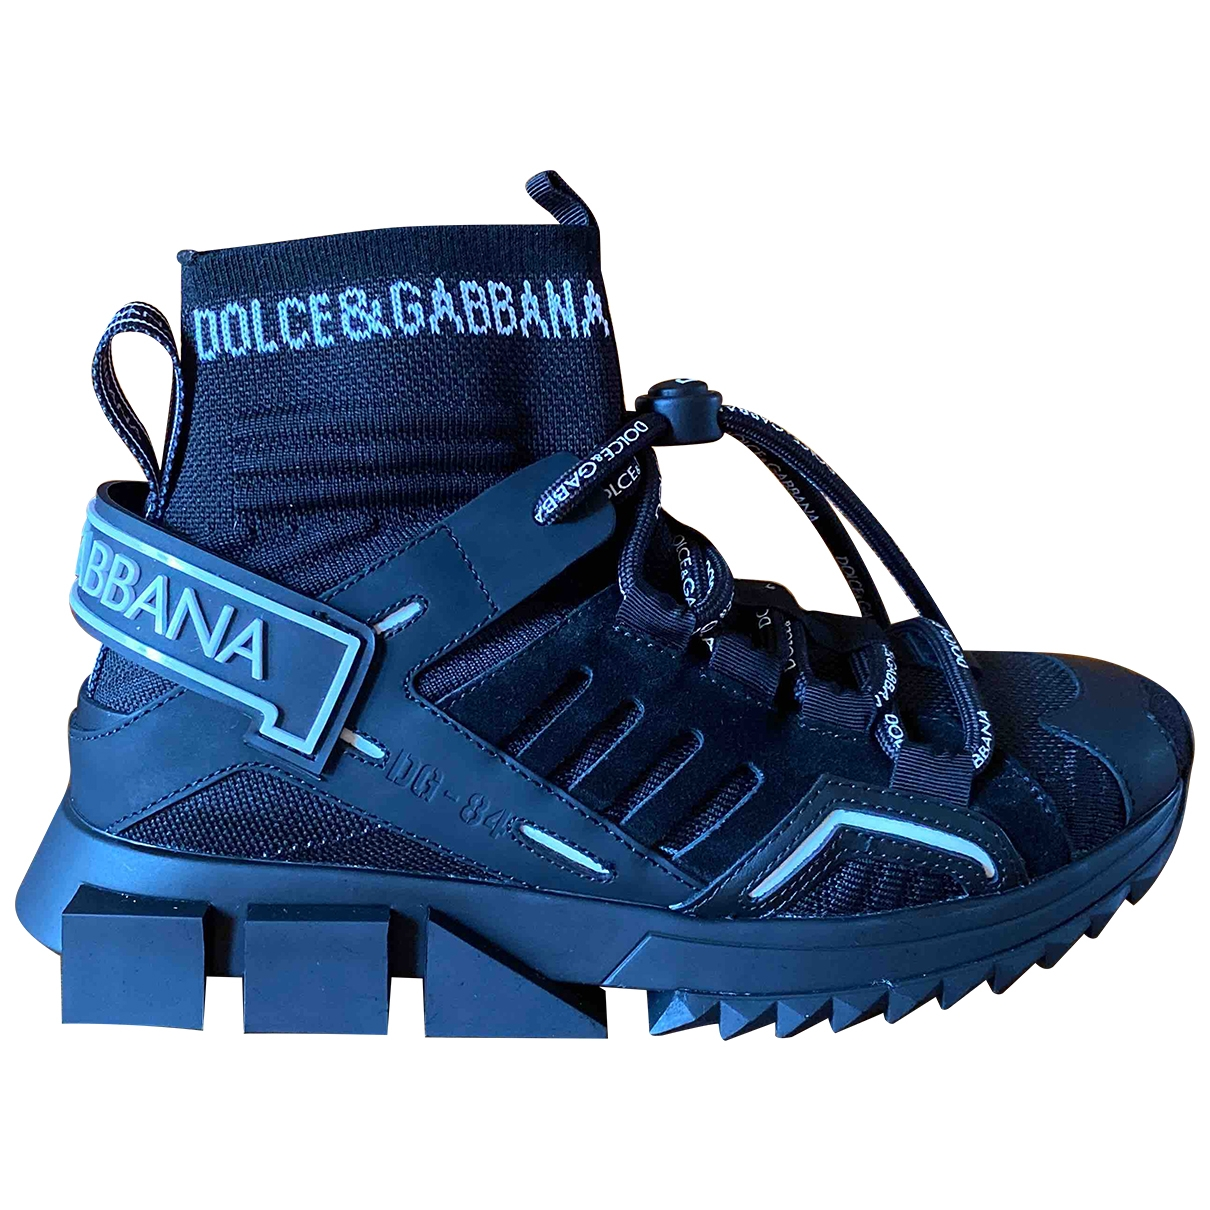 Dolce & Gabbana - Baskets Sorrento pour femme en toile - noir